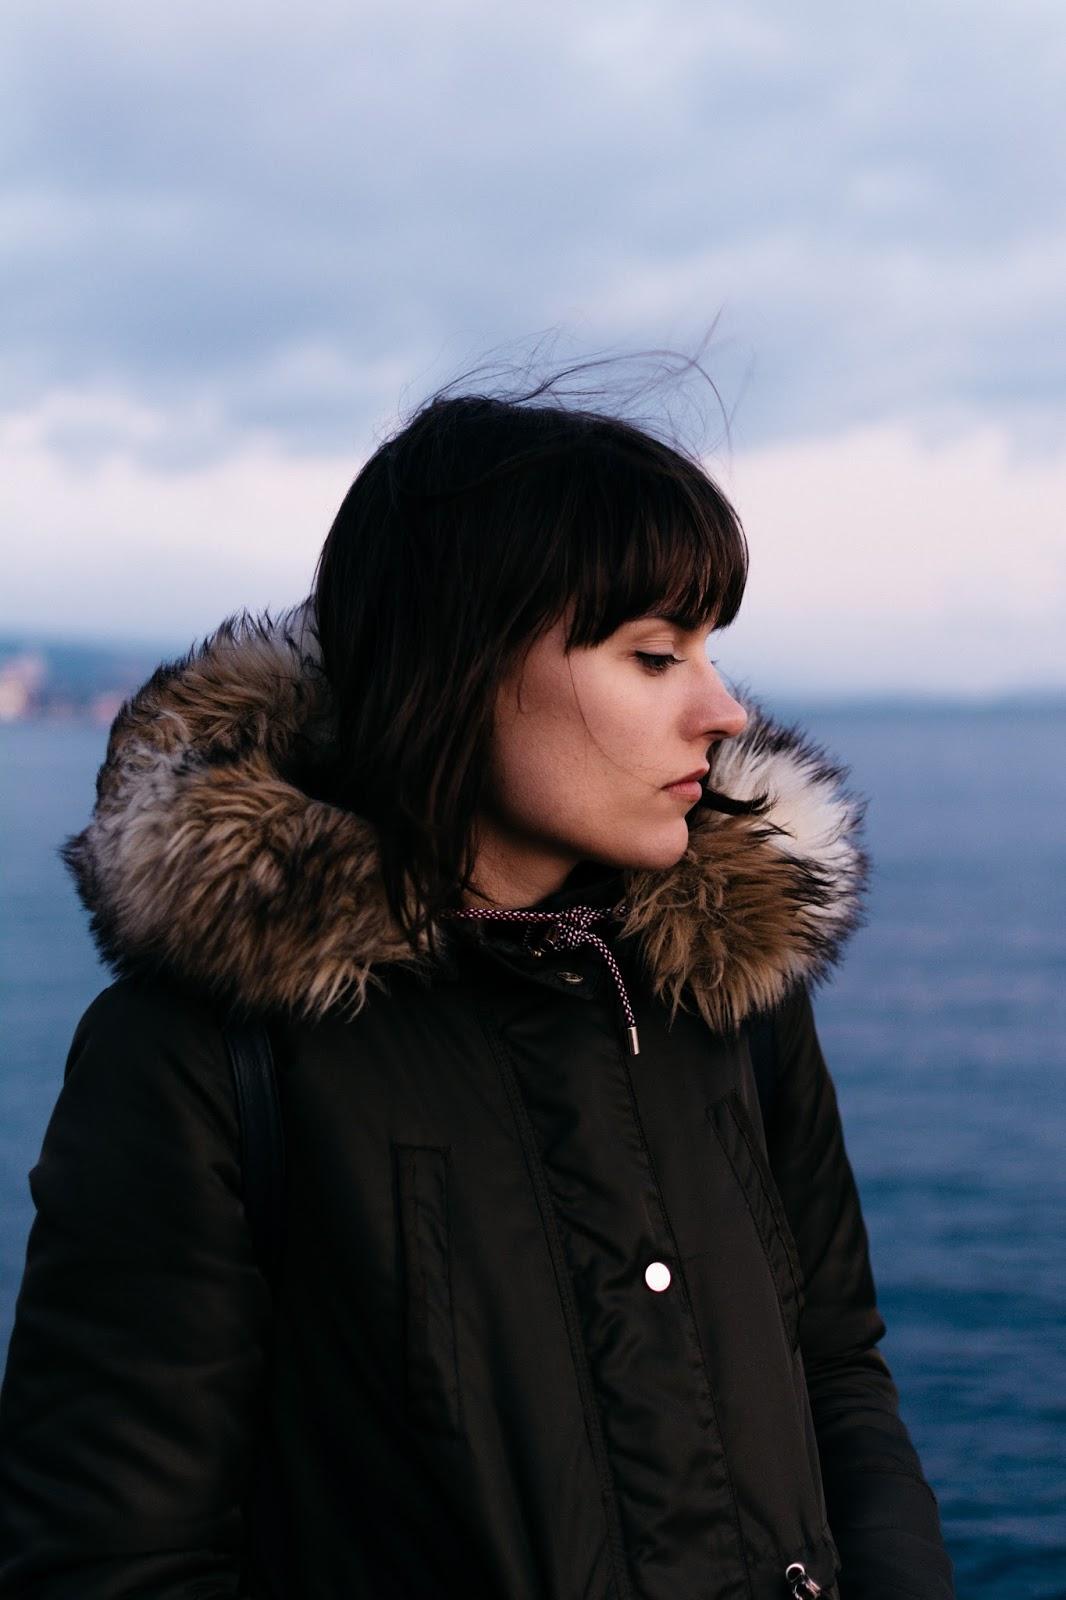 Ana portrait in wind